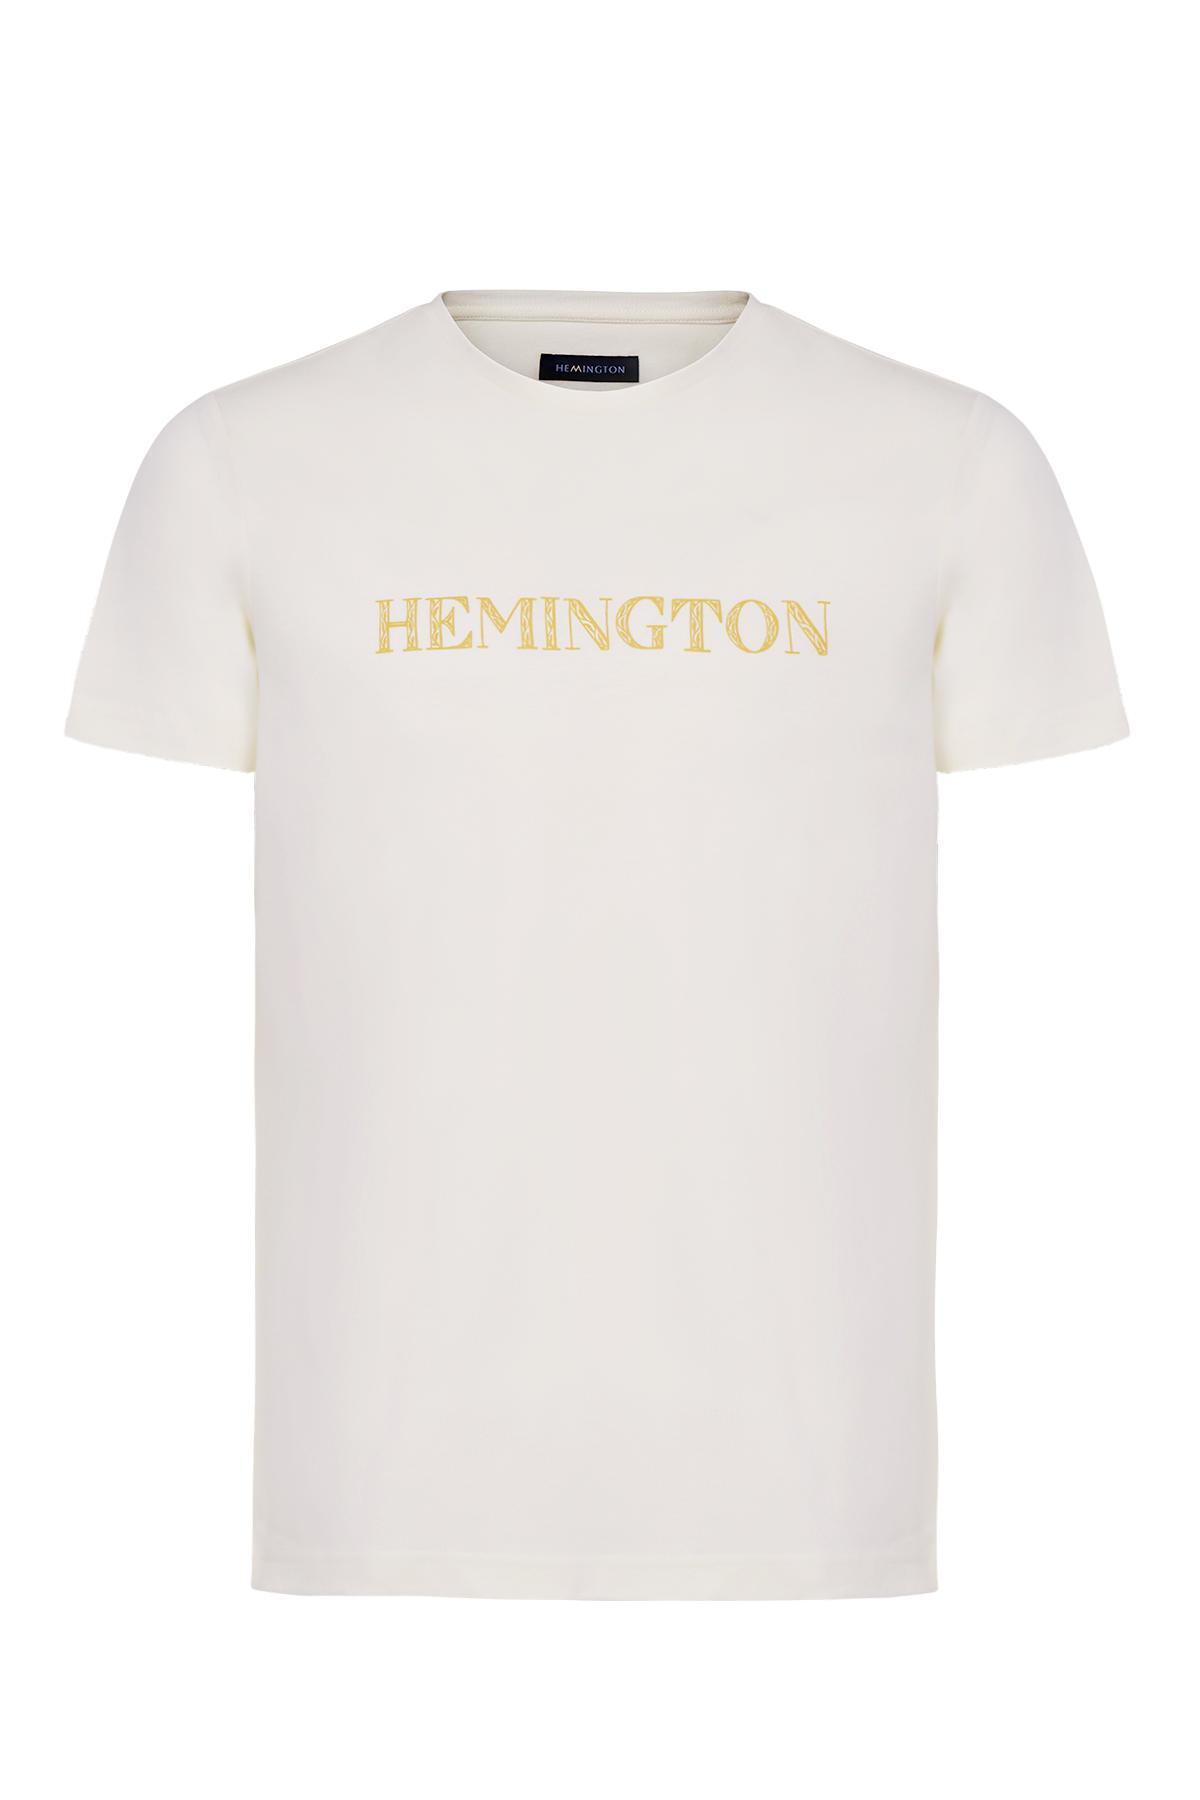 Logolu Bisiklet Yaka Kırık Beyaz T-Shirt